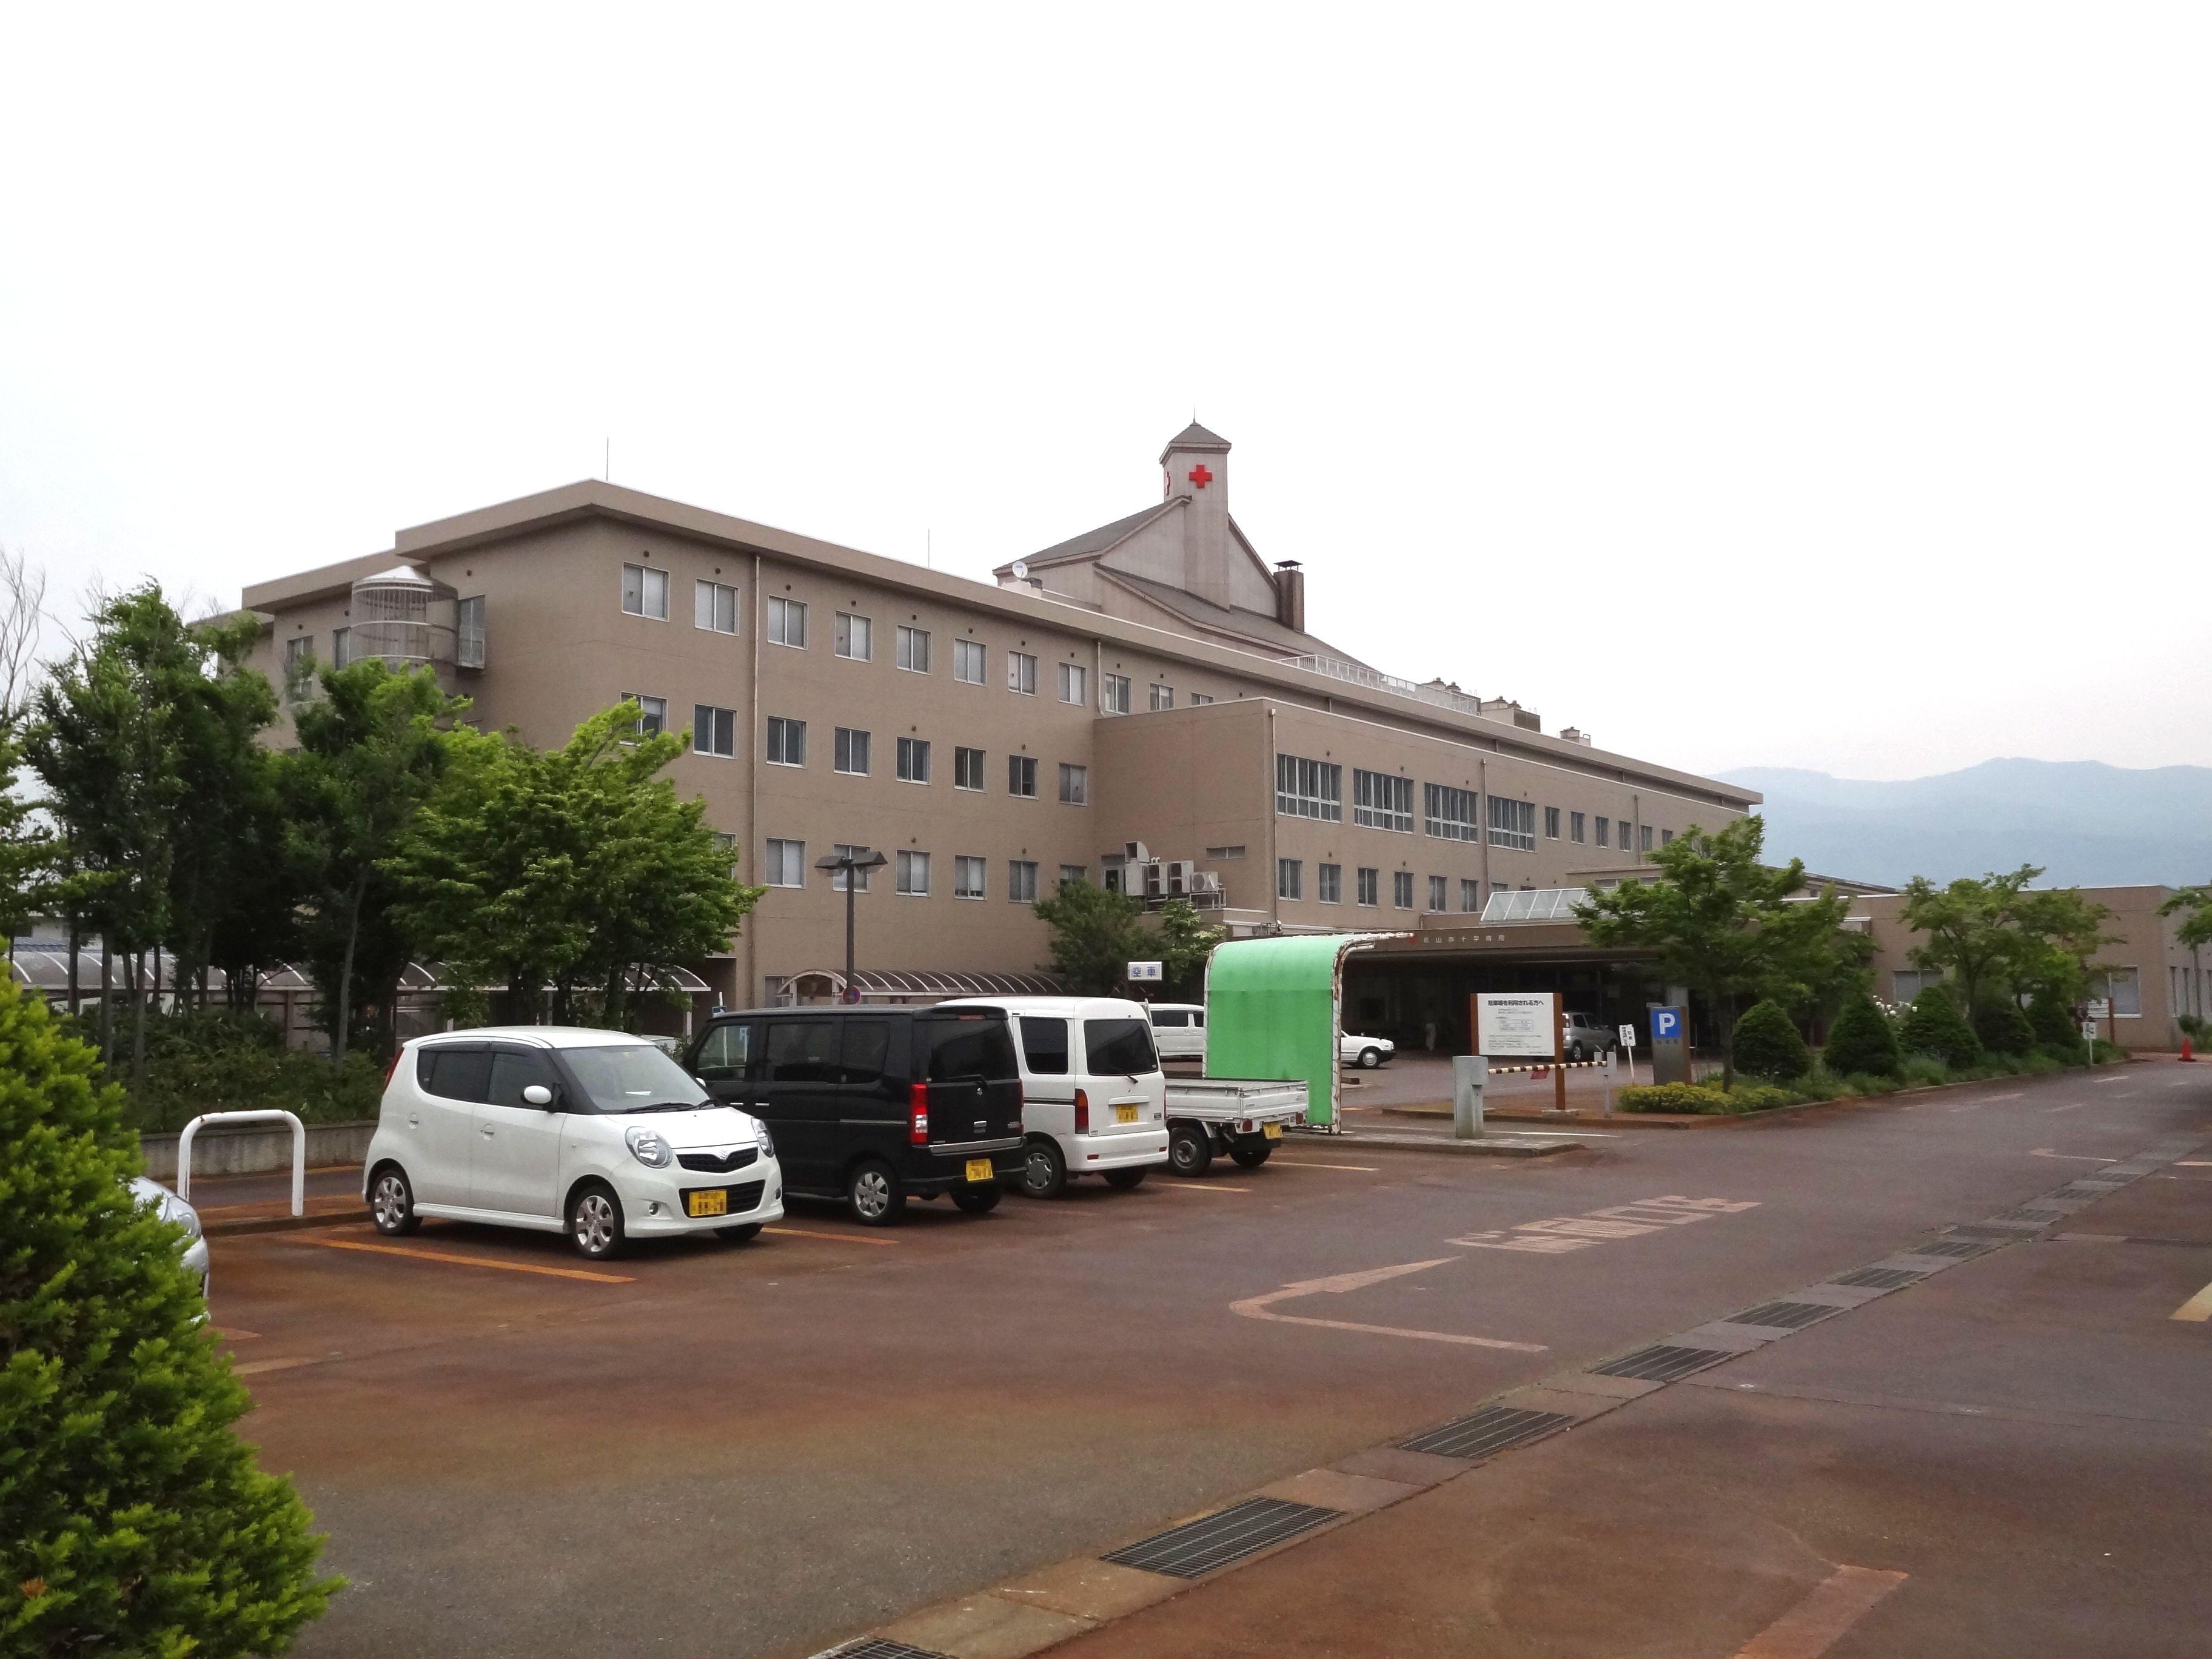 <b>飯山赤十字病院</b> - Wikipedia